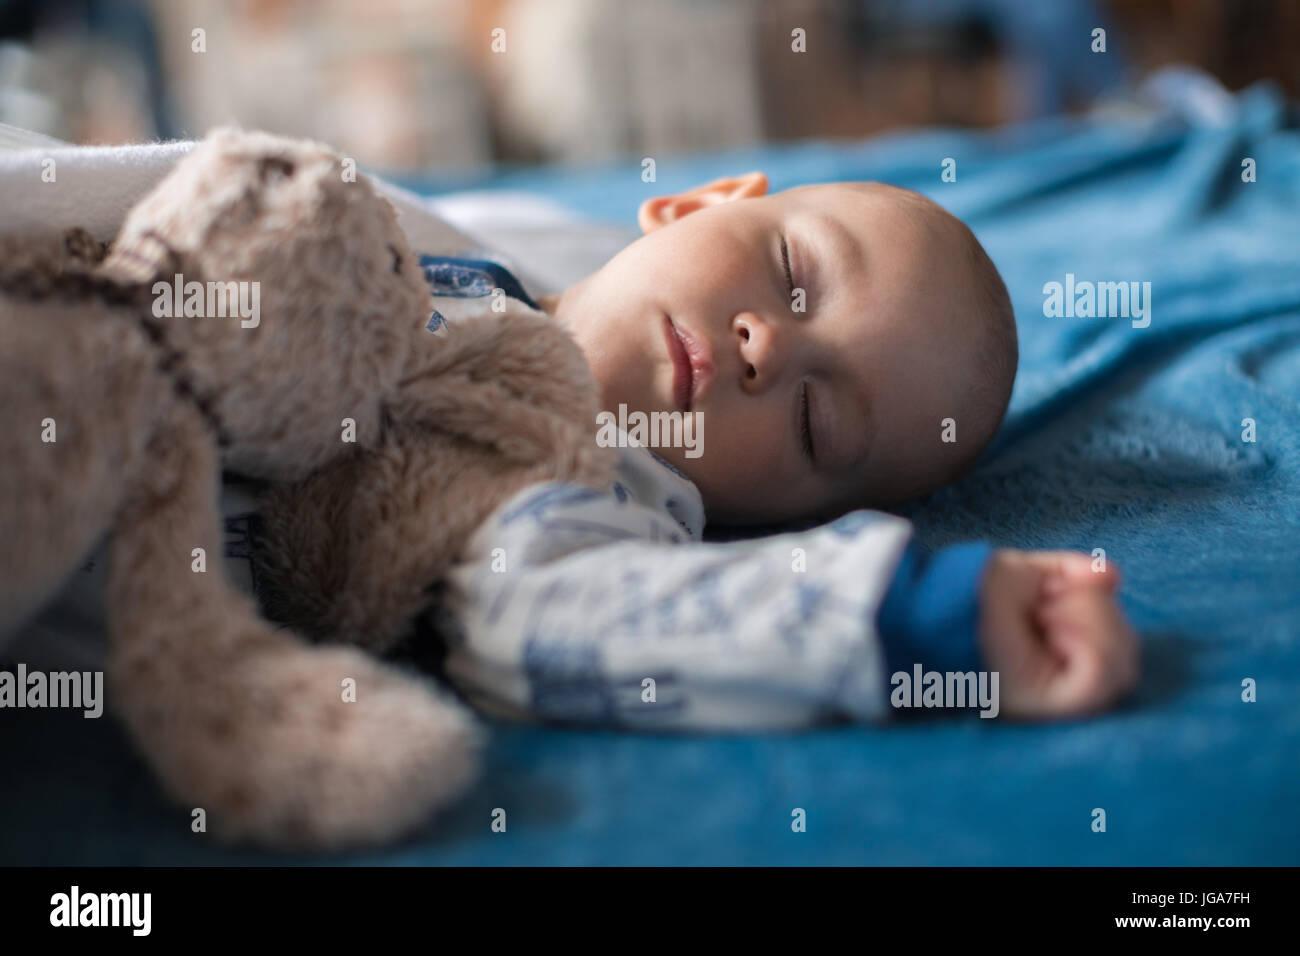 Cute baby boy sleeping with teddy bear - Stock Image